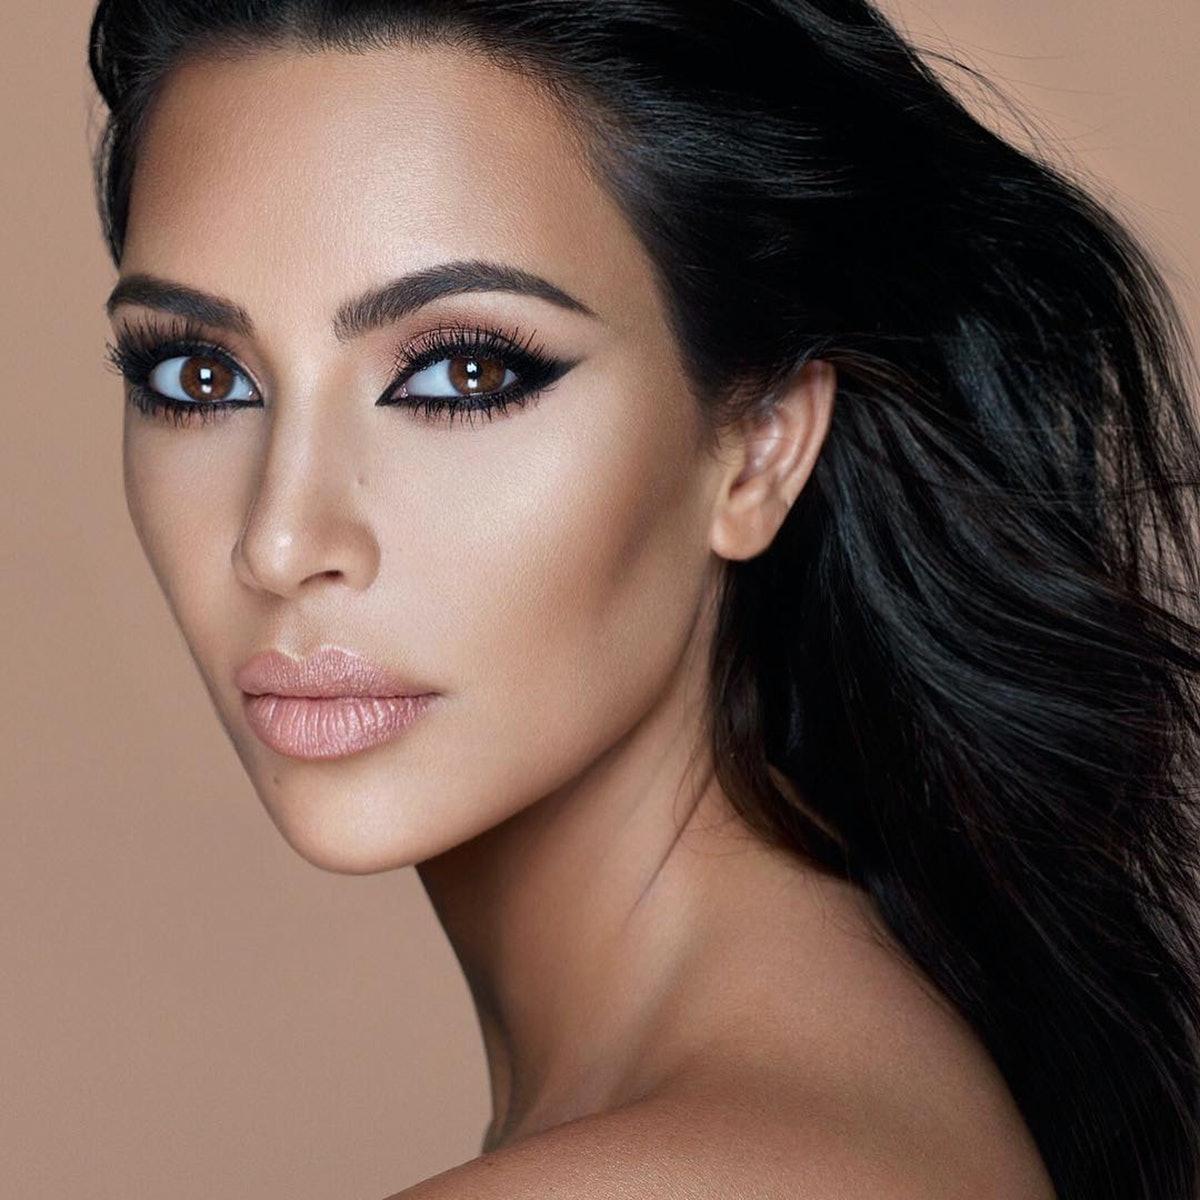 Kim Kardashian Just Teased An Upcoming KKW Beauty Lipstick